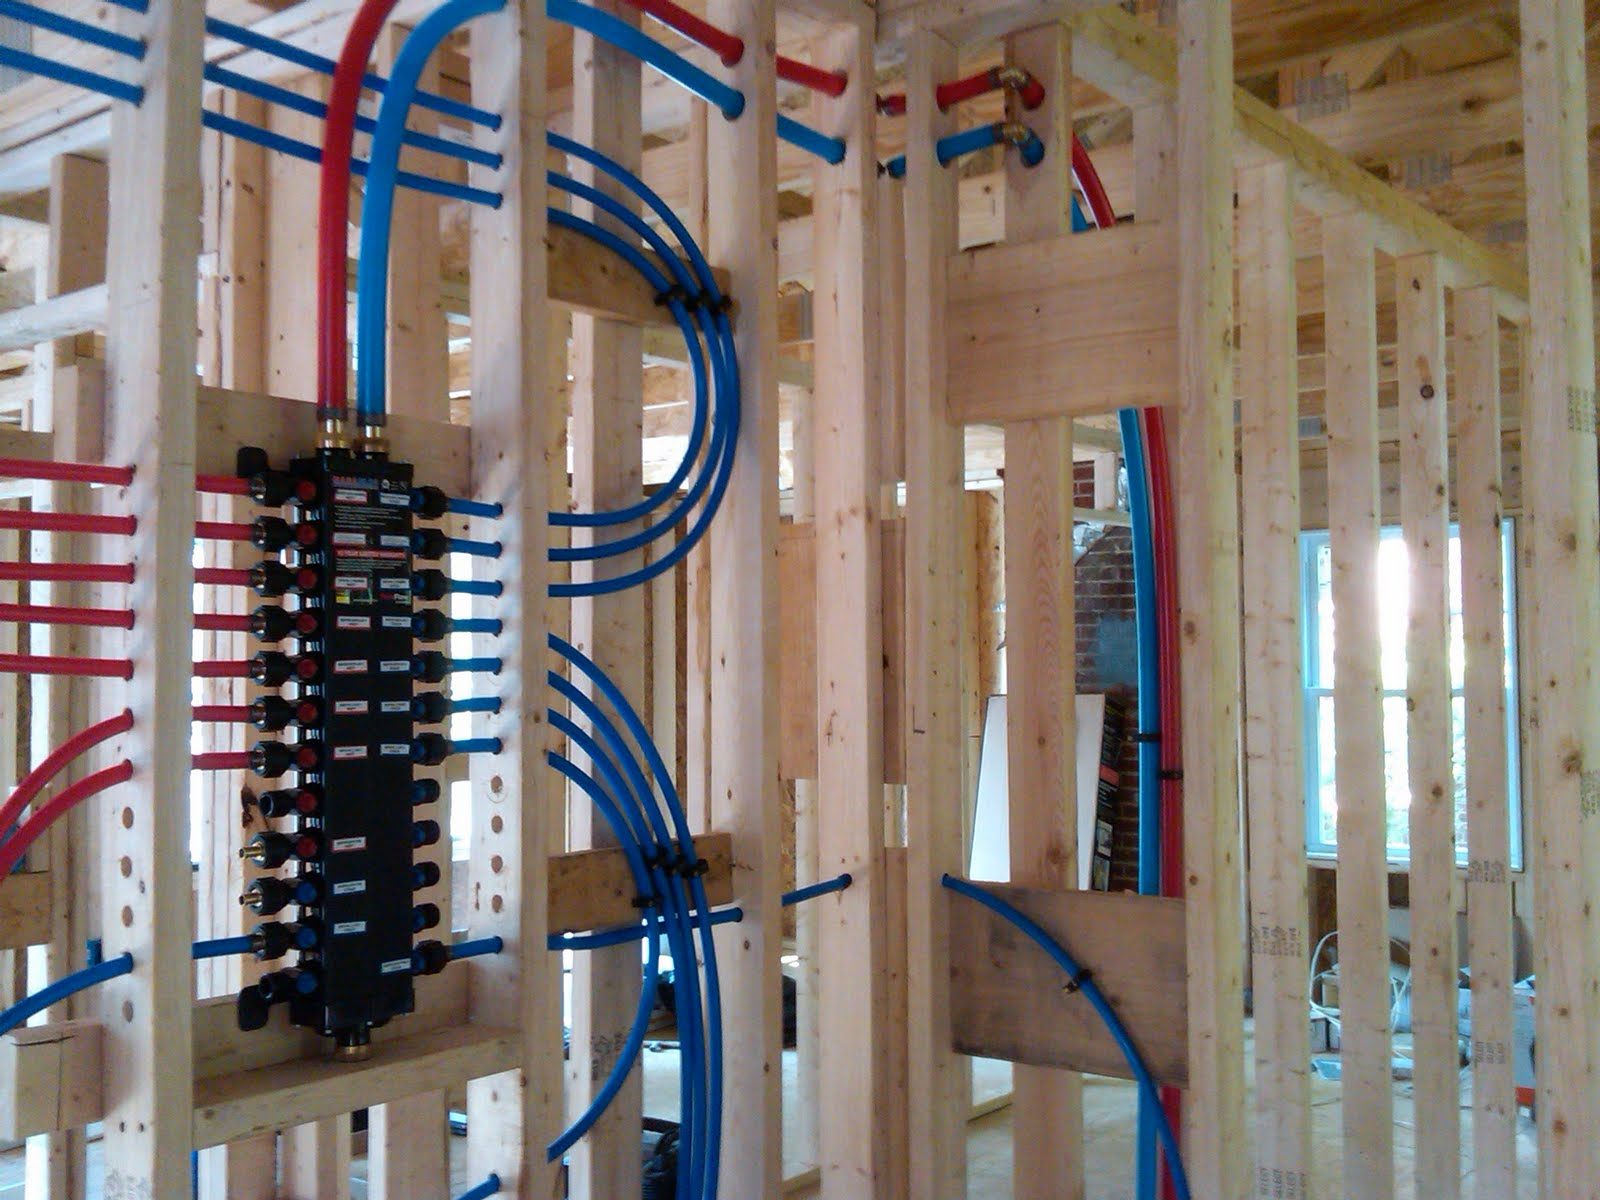 Plumbing Manifold Diagram Ford Capri Mk1 Wiring Pex Bathroom Trusted Diagrams